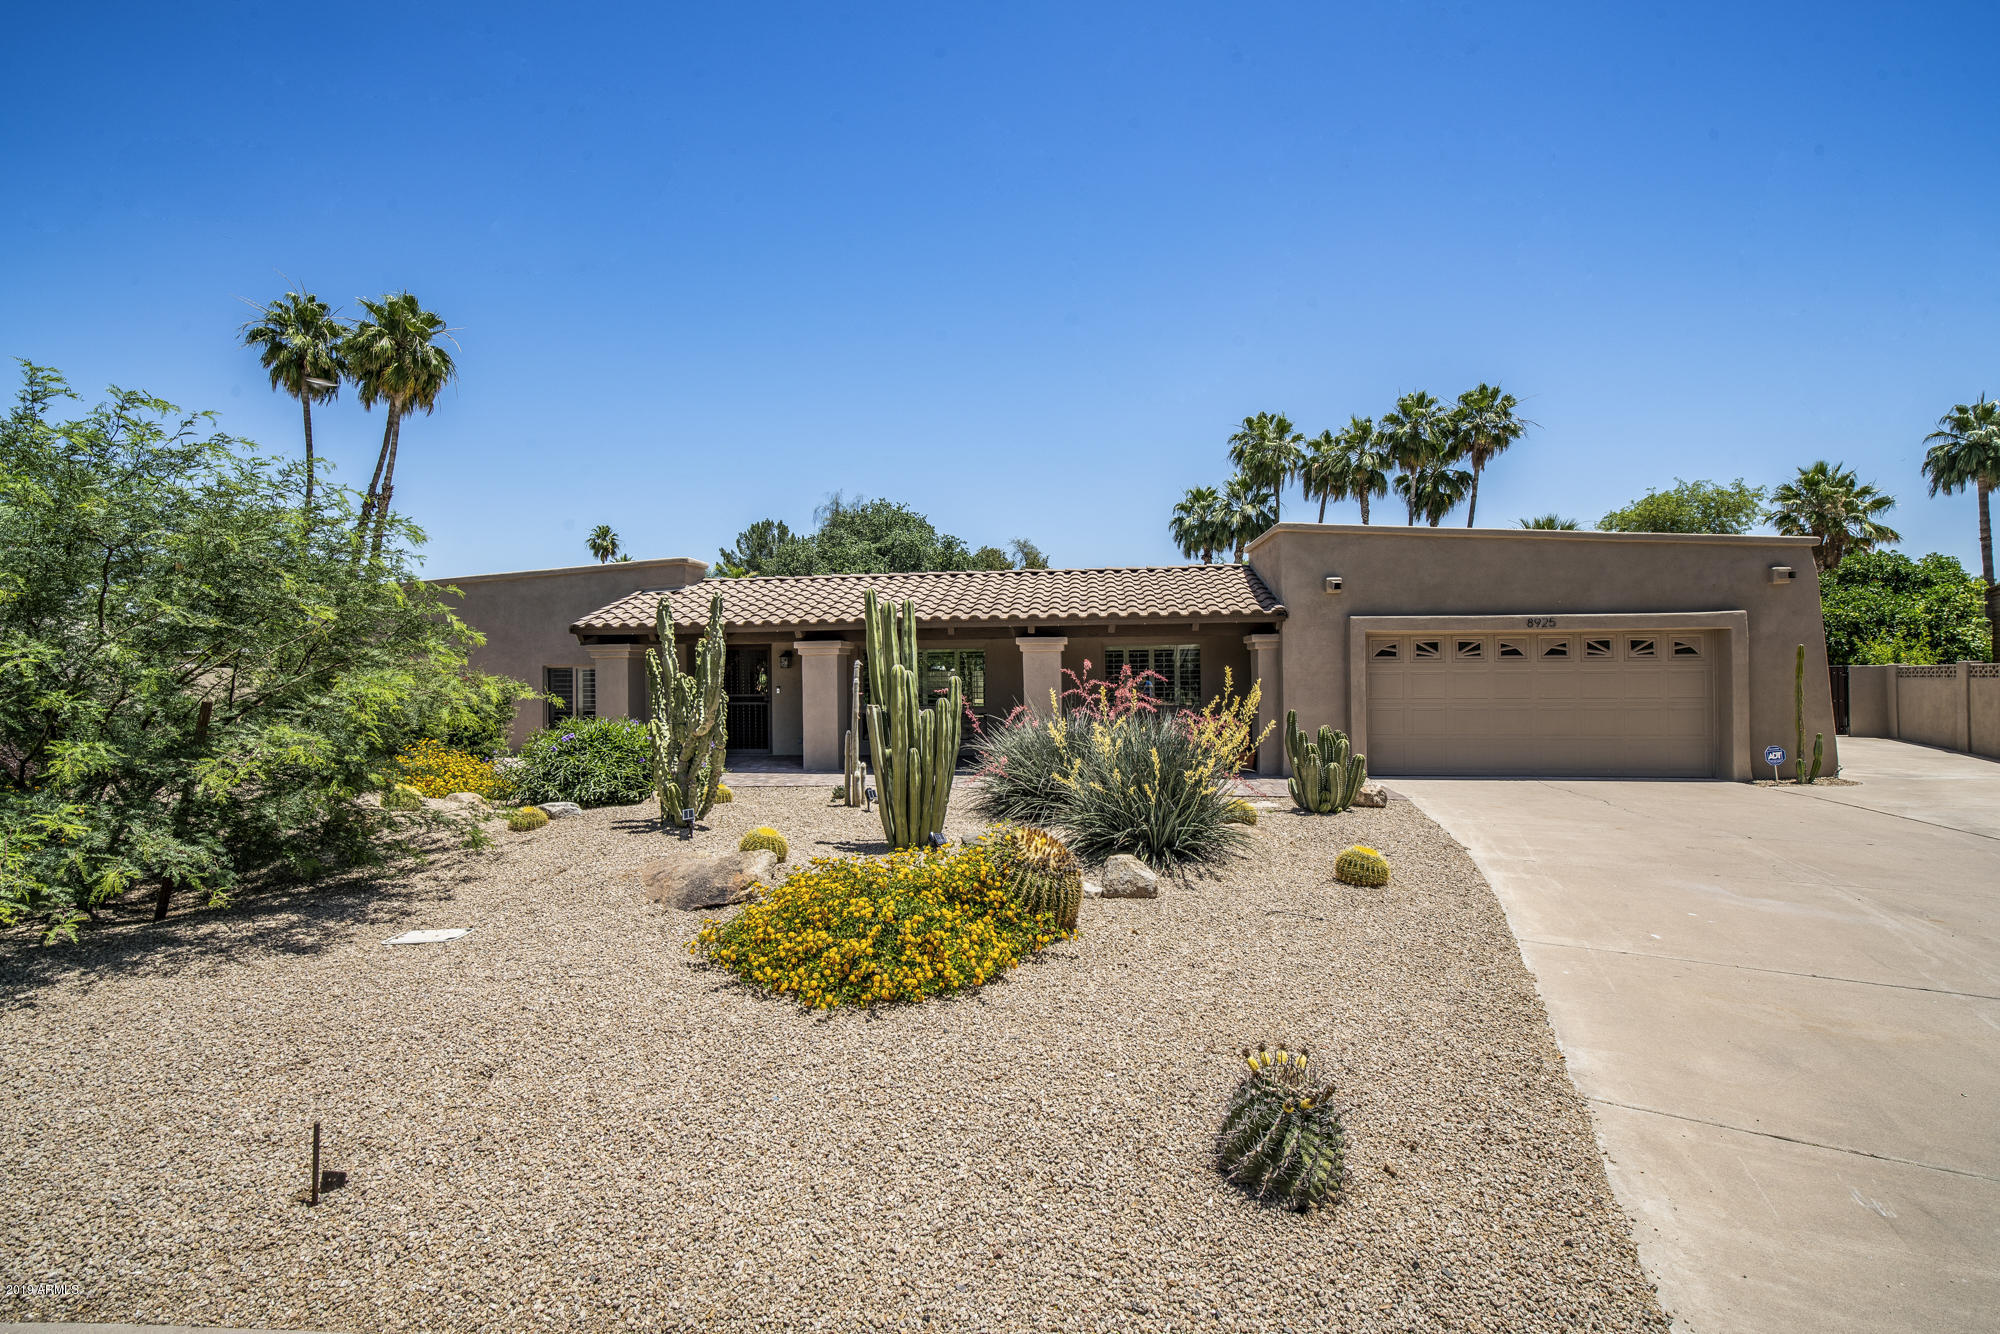 Photo of 8925 N 80th Way, Scottsdale, AZ 85258